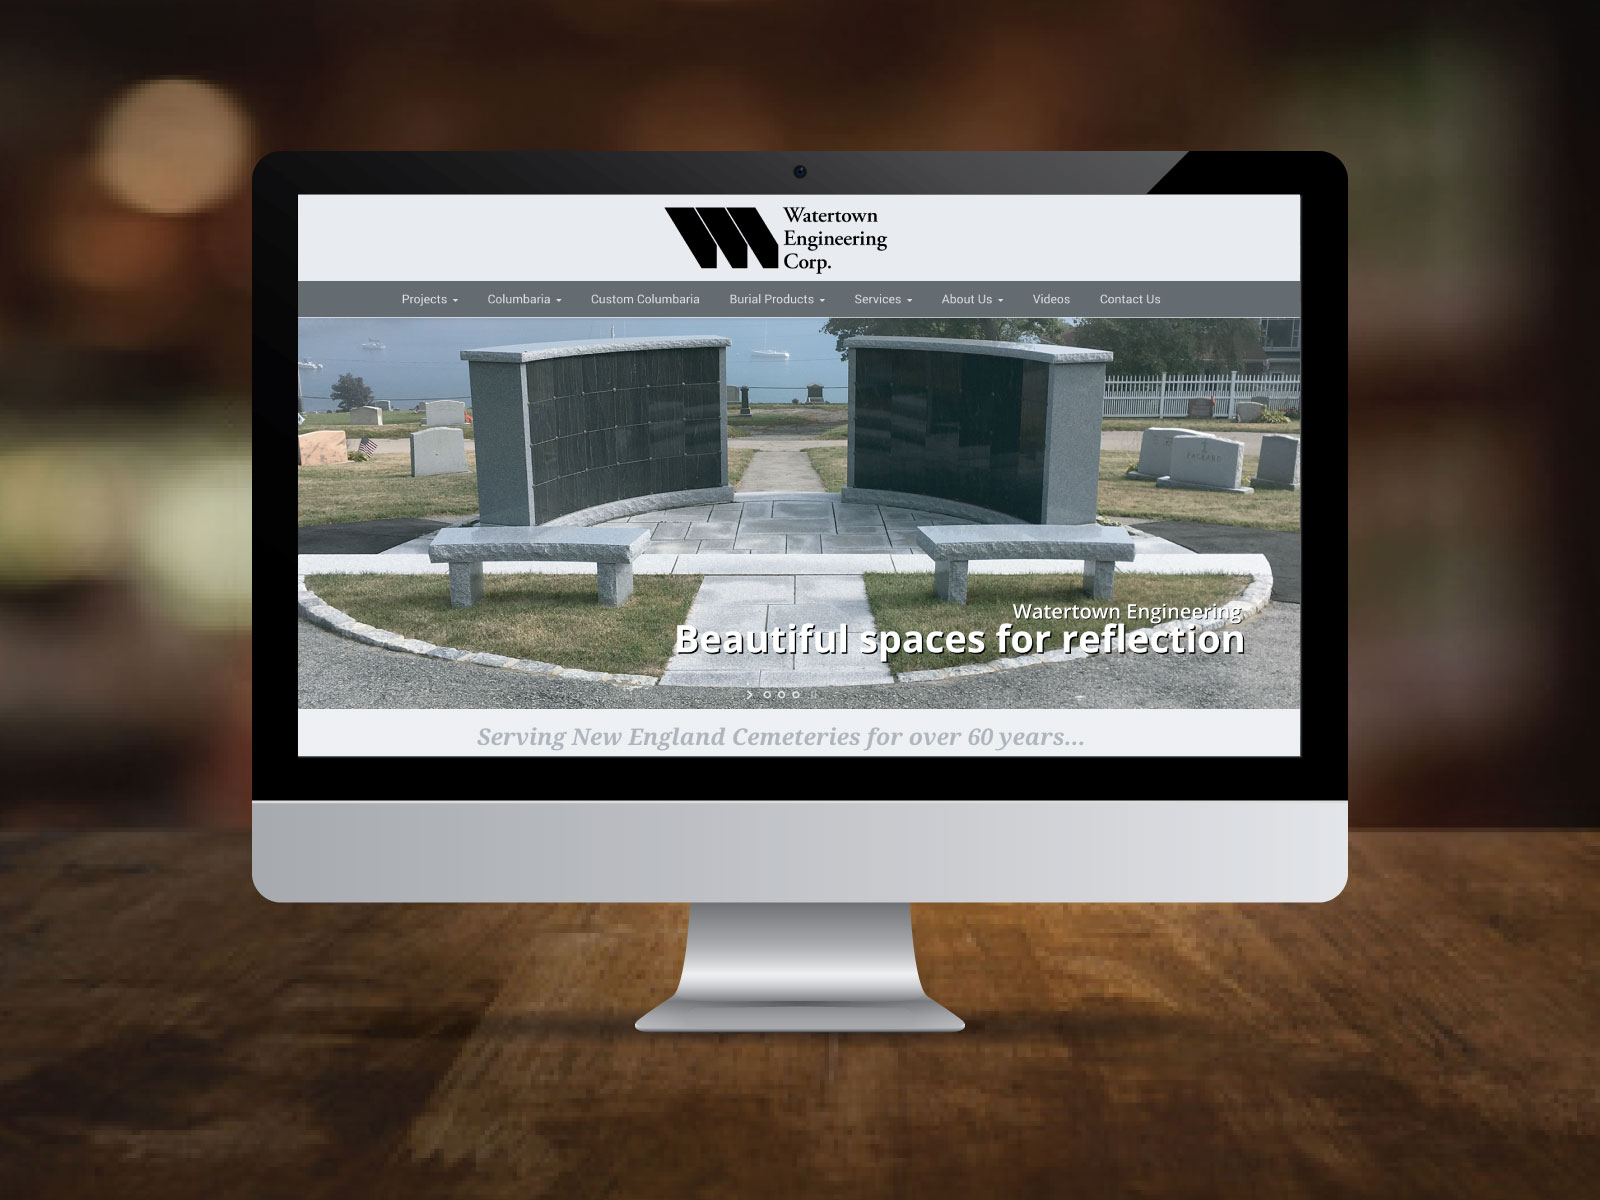 Watertown Engineering Corporation